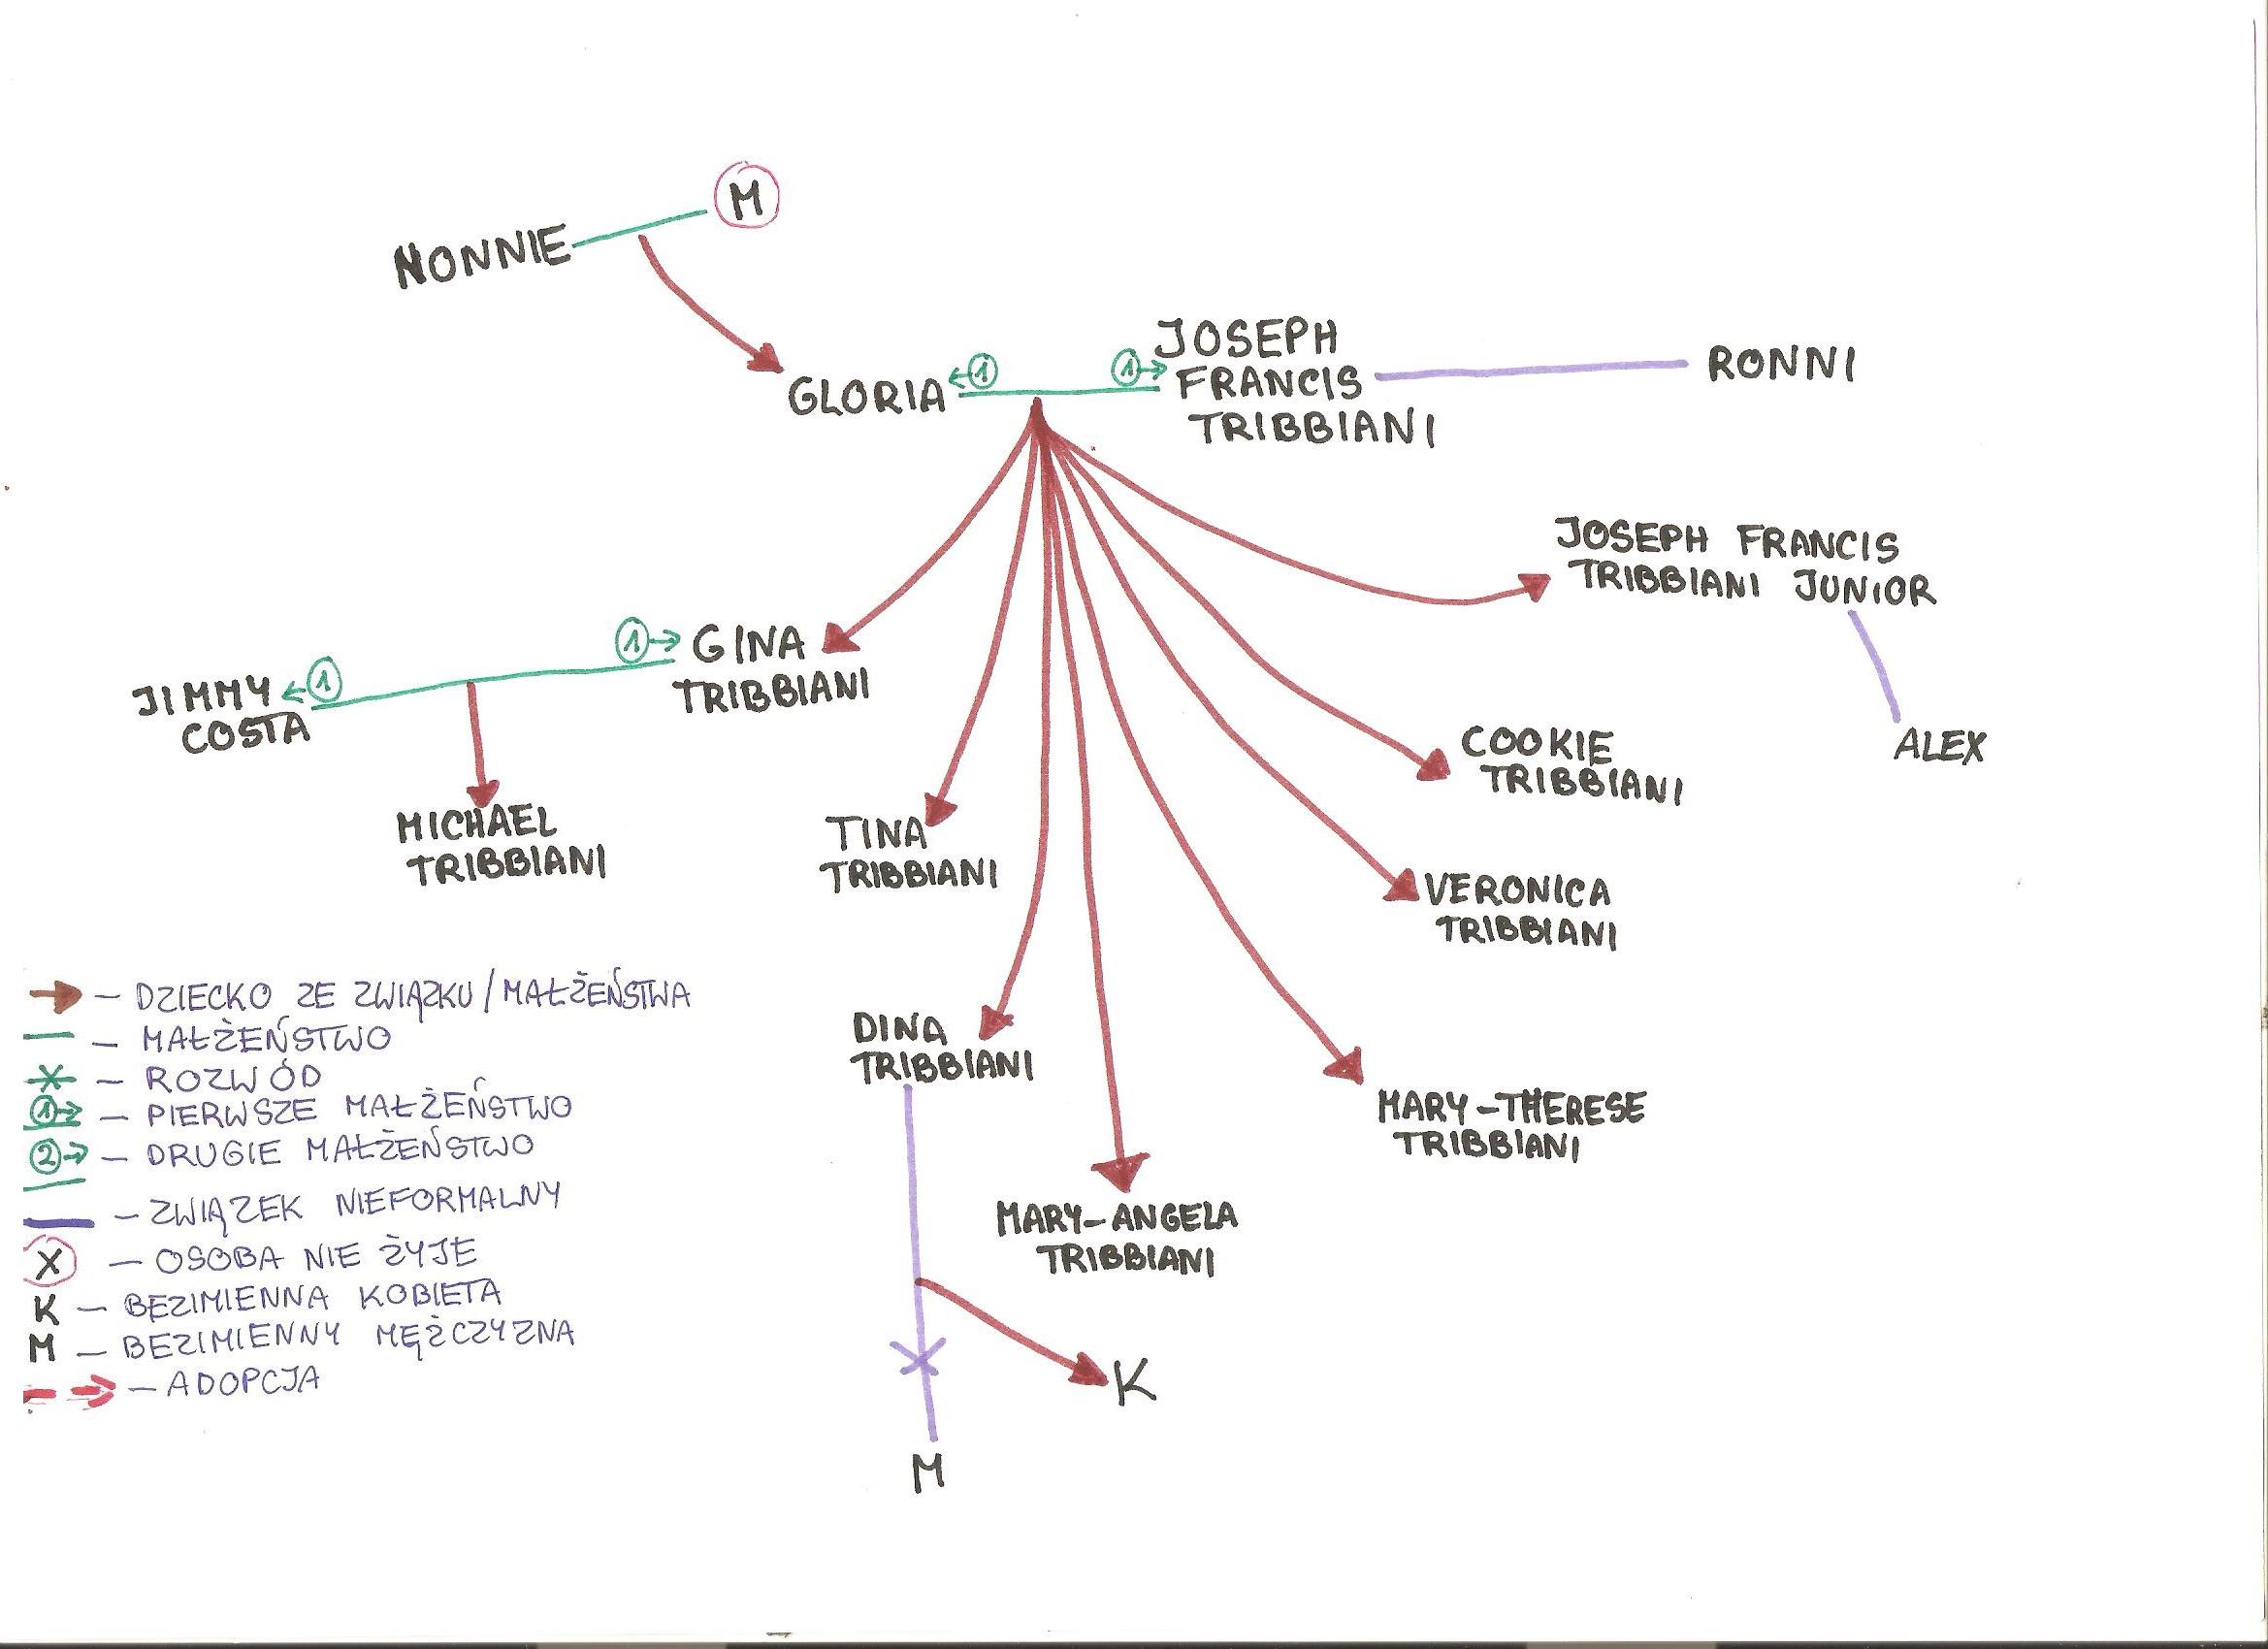 20 Generation Pedigree Chart: Joey Tribbiani7s family tree.jpg - Wikimedia Commons,Chart